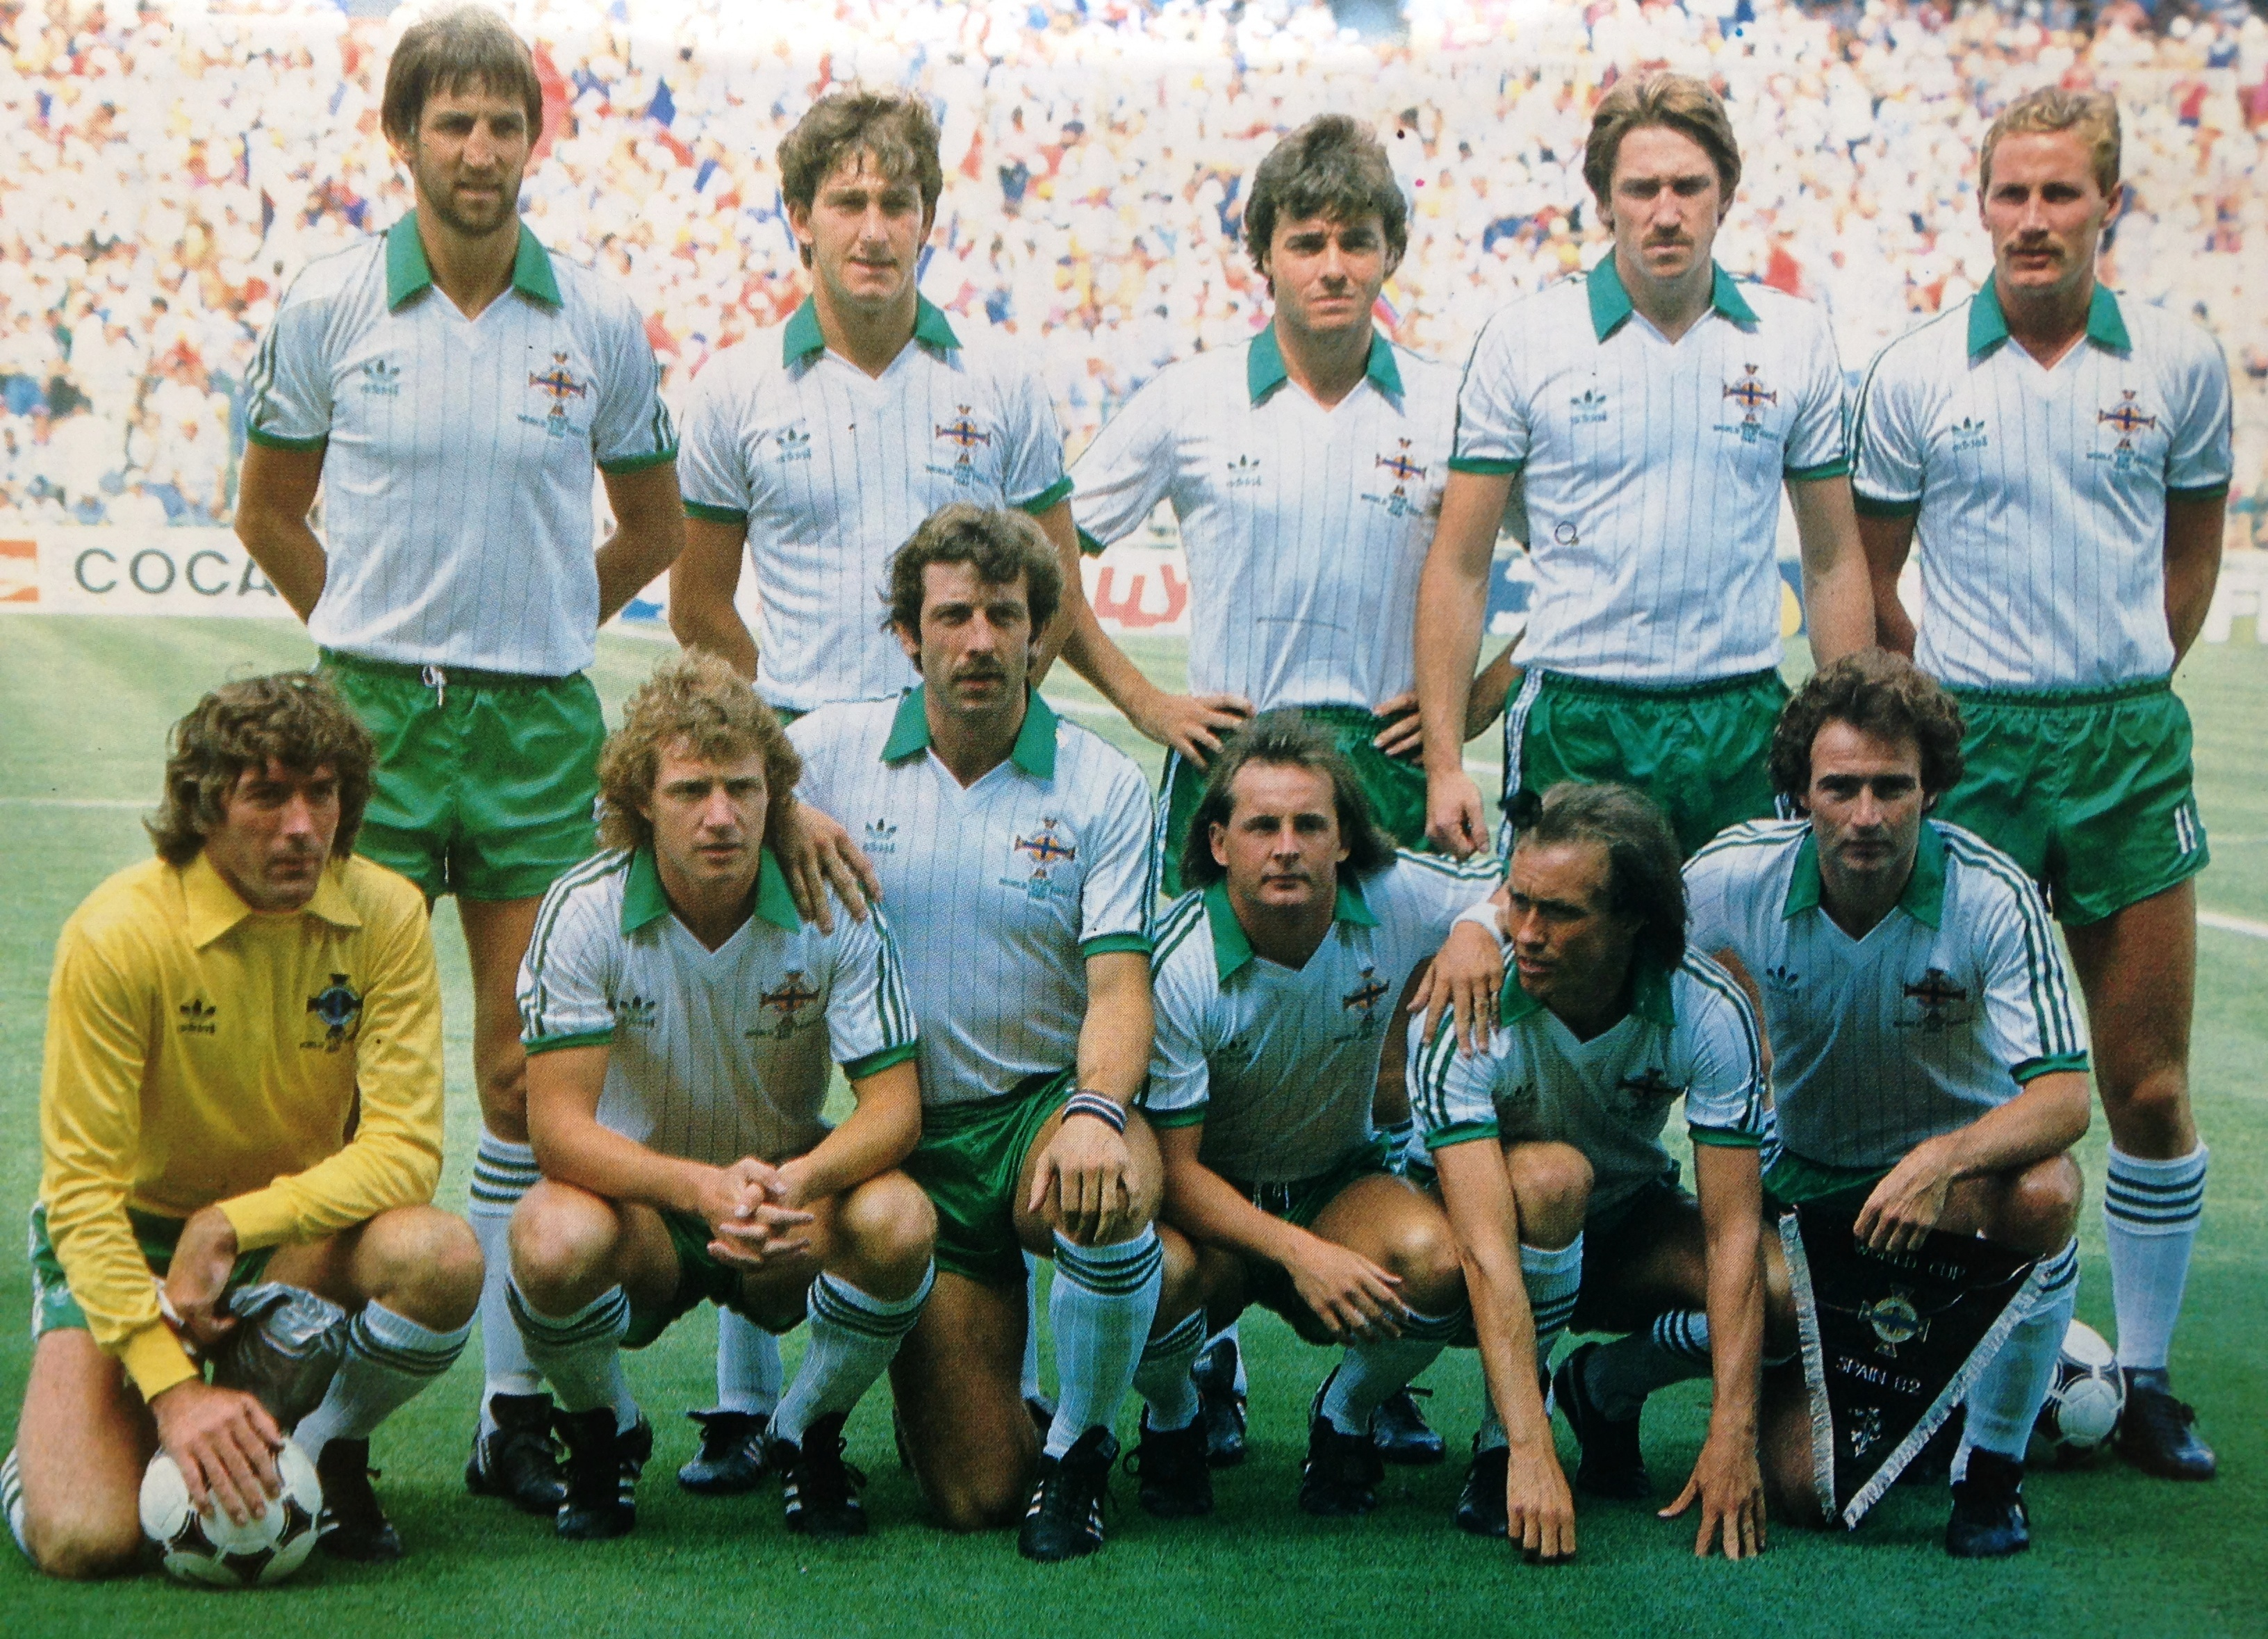 wchd-1982-ireland-team